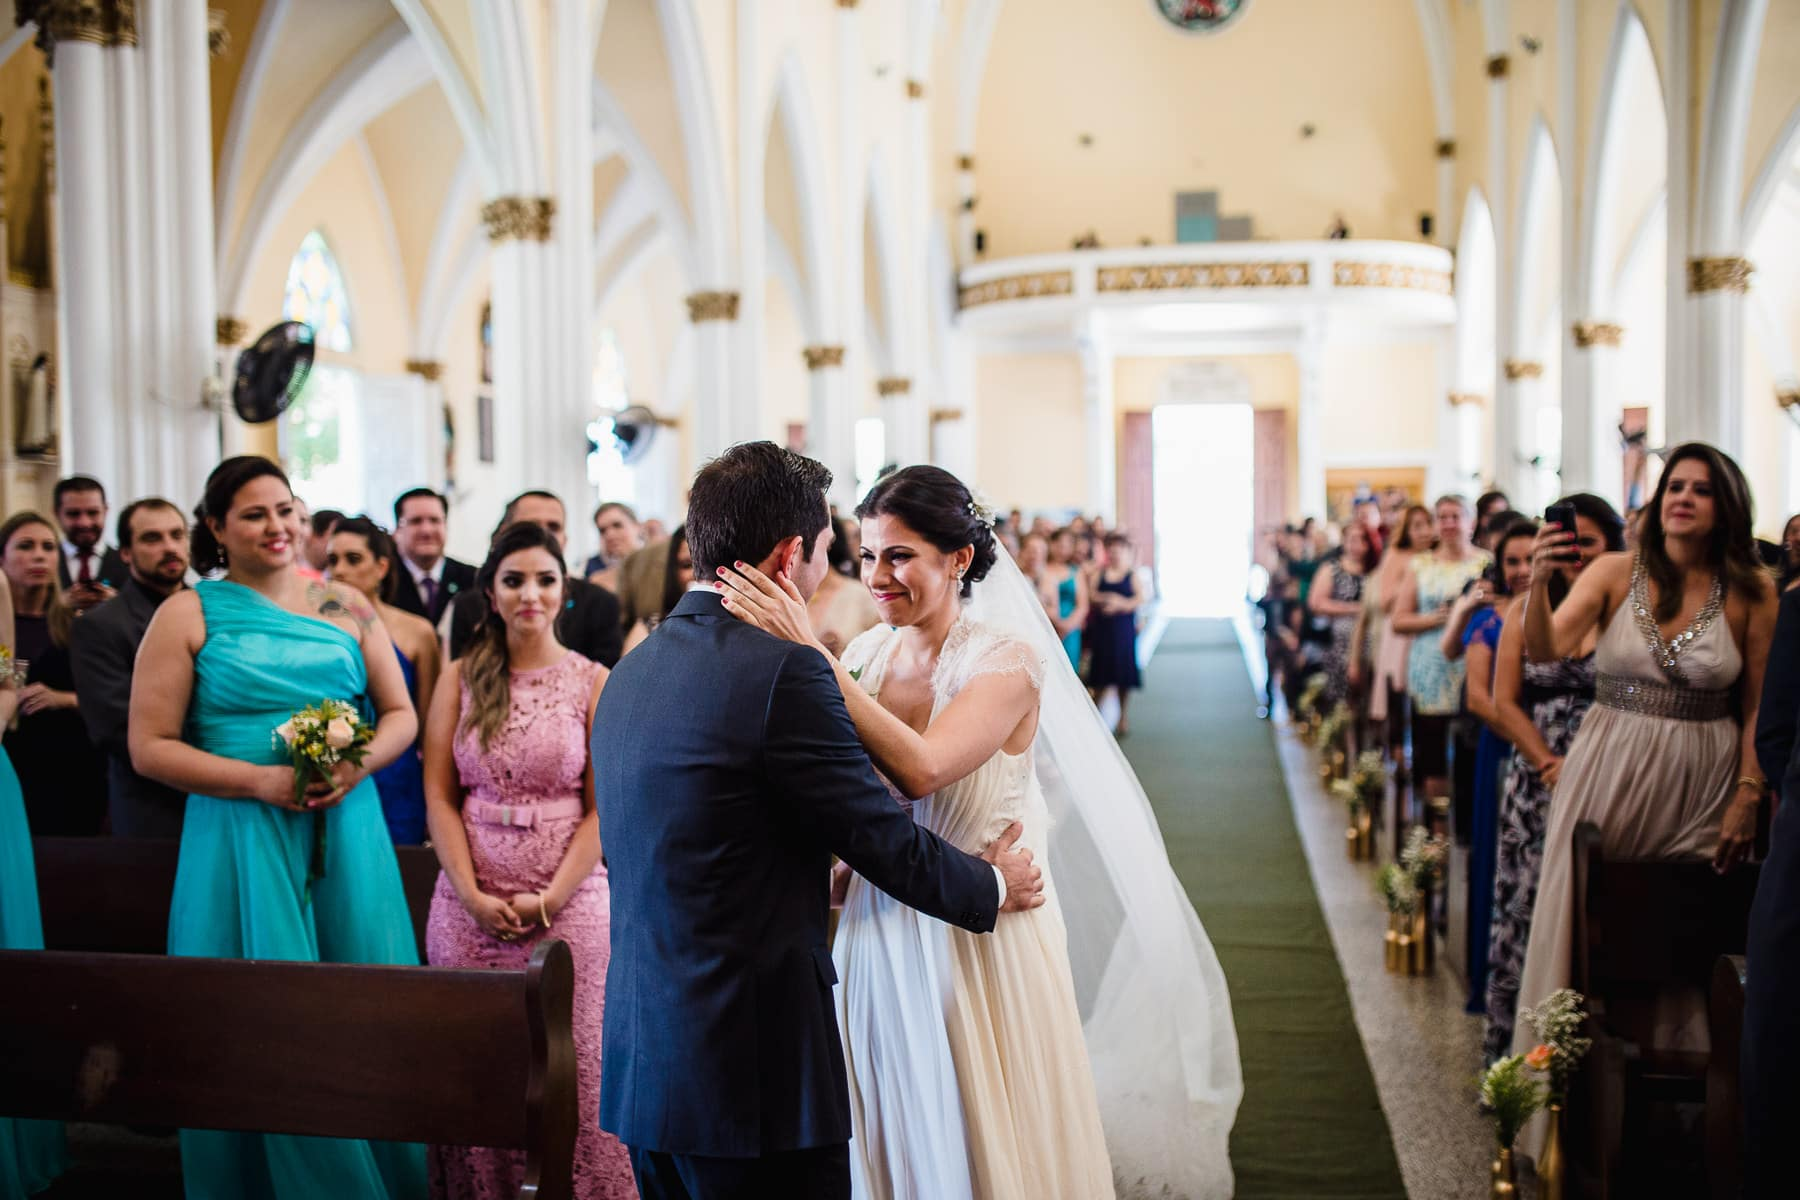 casamento-igreja-do-cristo-rei-fortaleza-24